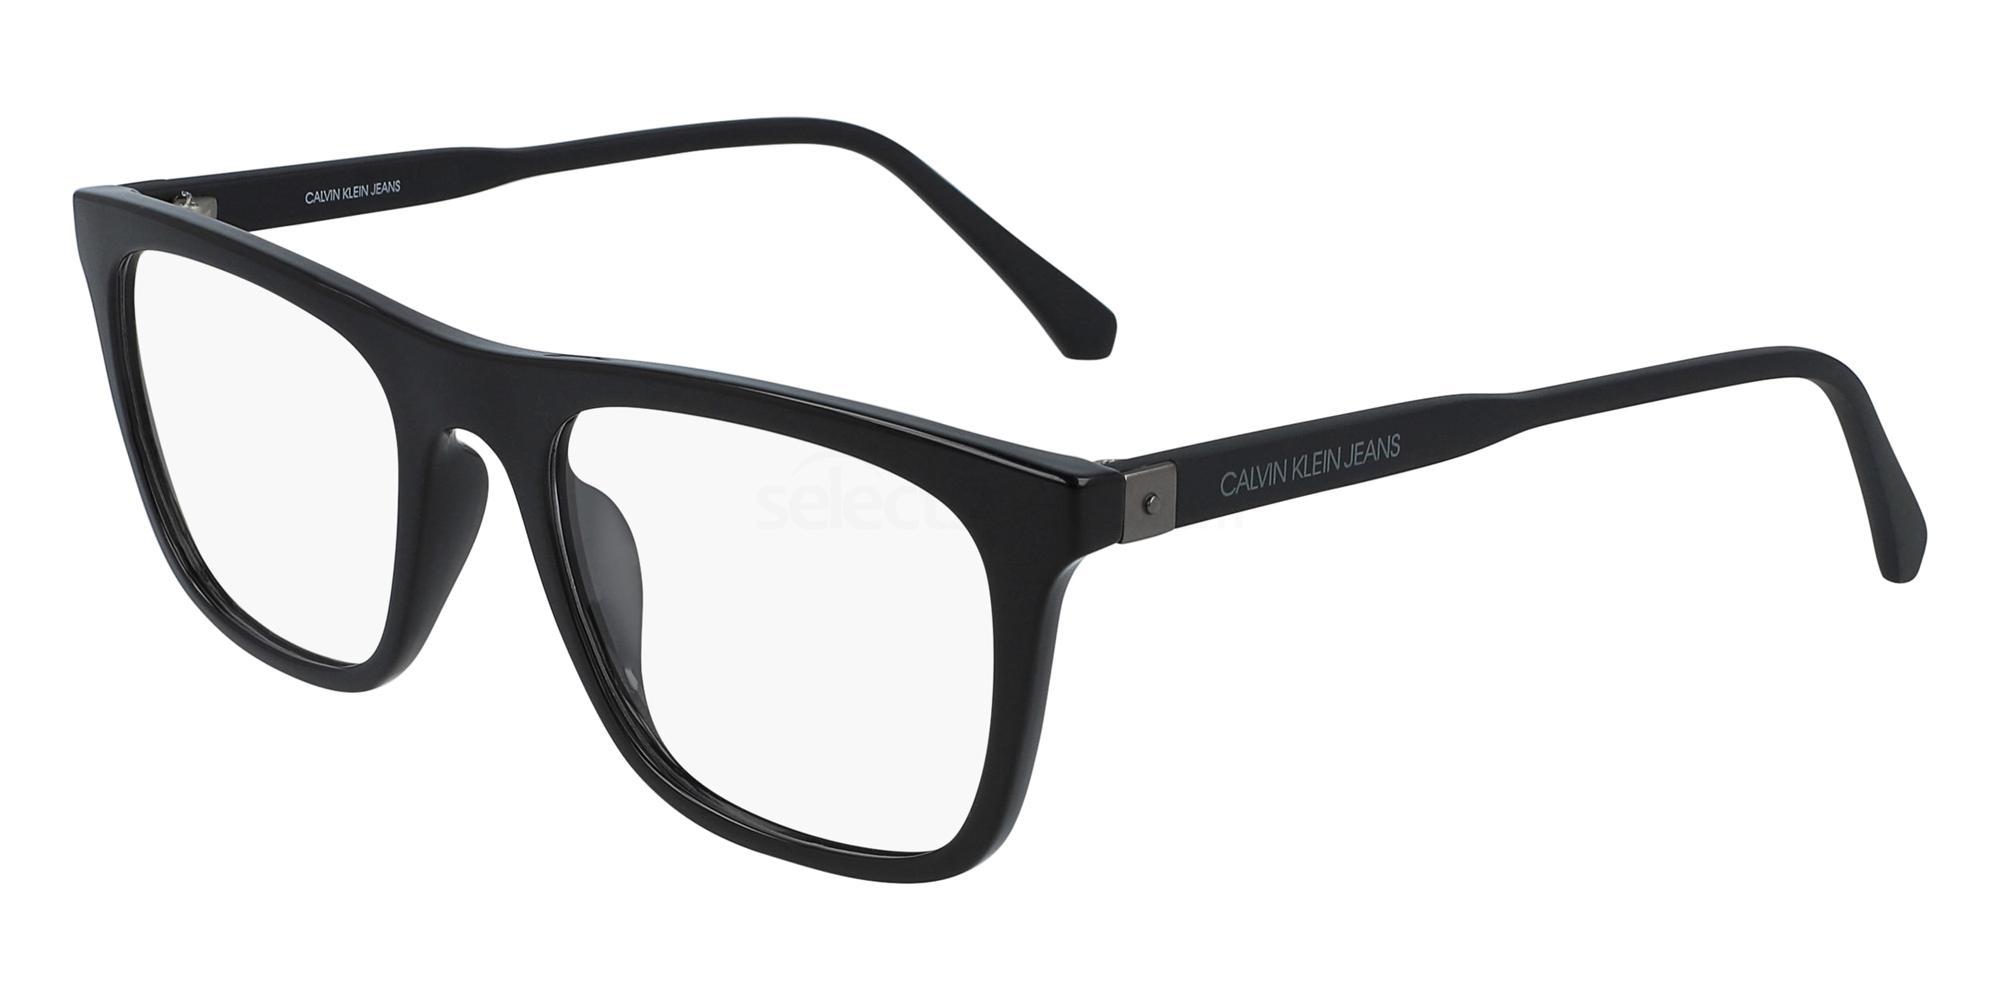 001 CKJ19524 Glasses, Calvin Klein Jeans